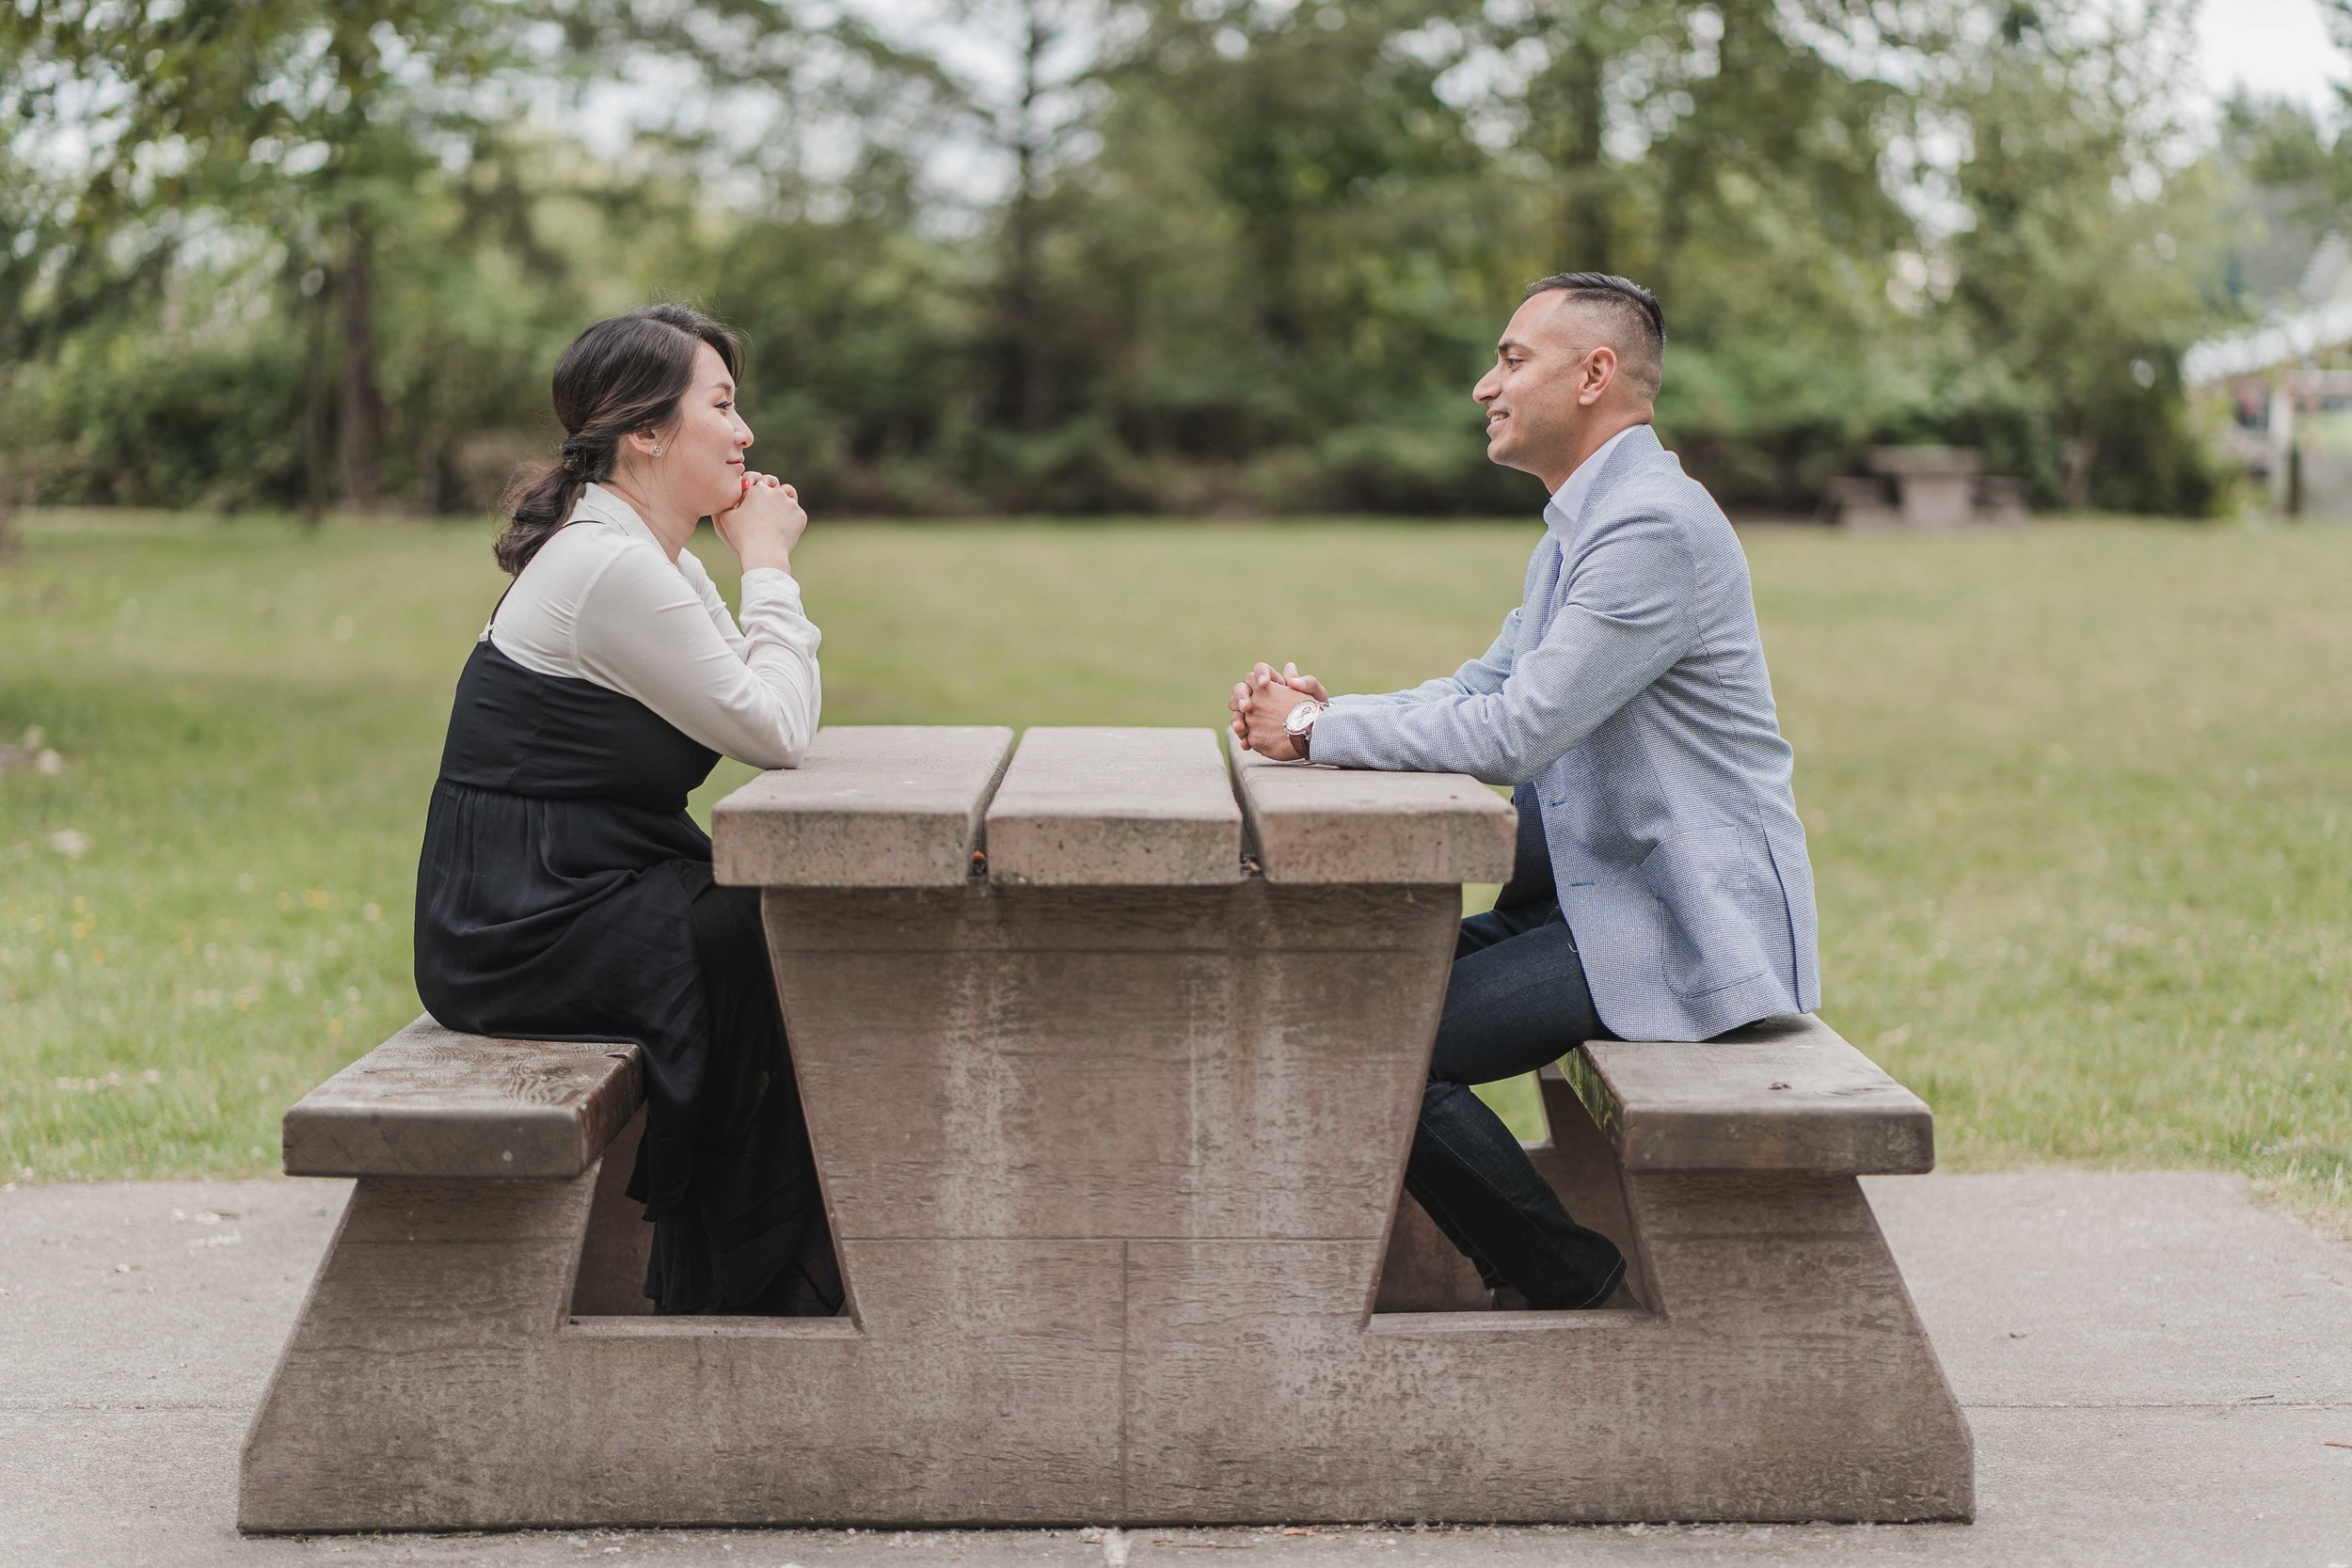 20190622 - Monika & Johnson Engagement - 0161.jpg